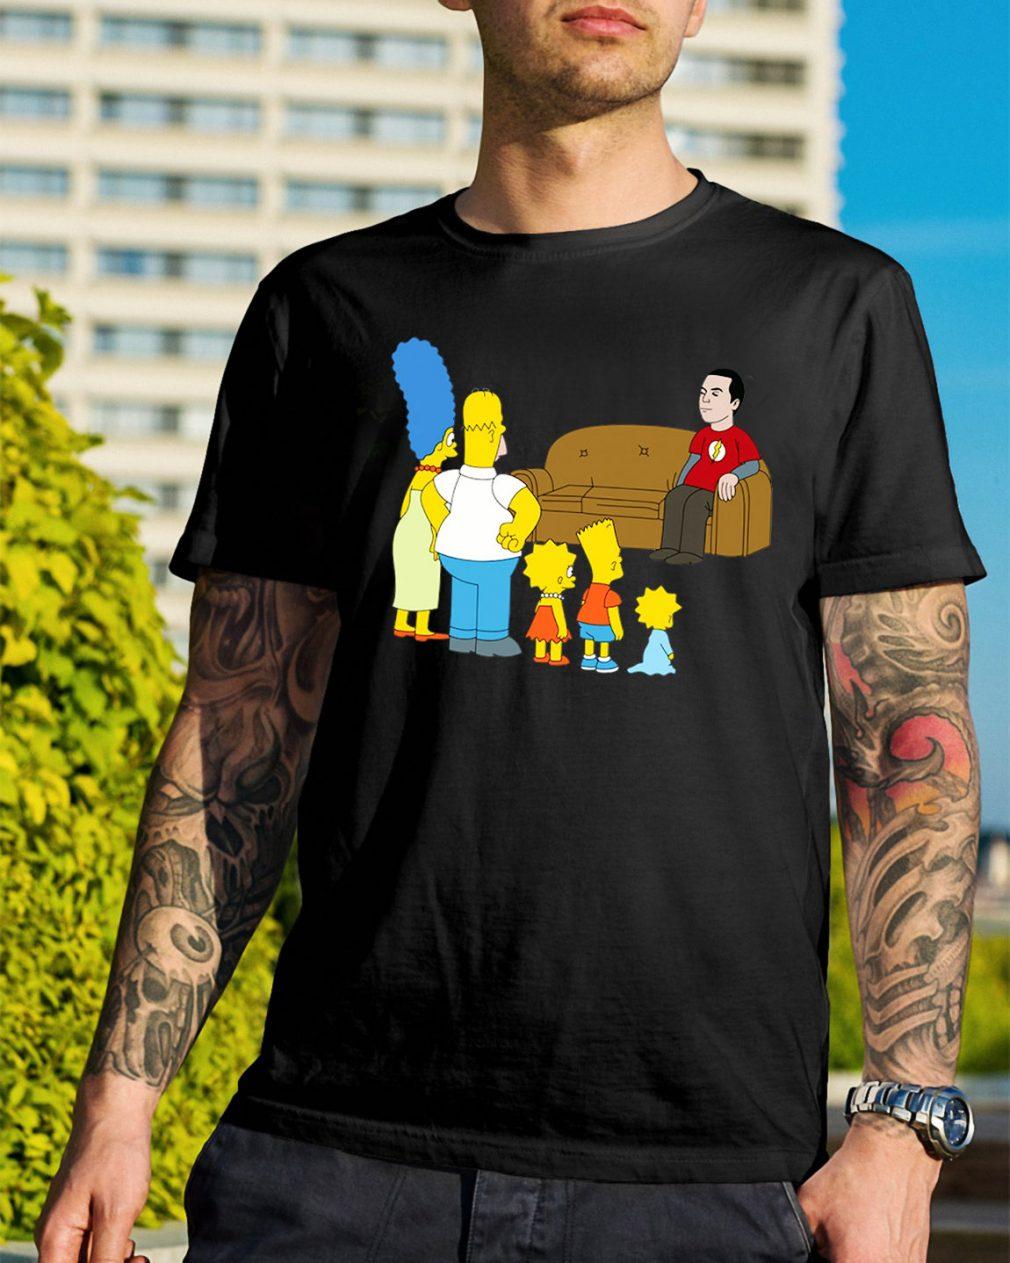 The Simpsons Sheldon Cooper - Bazinga shirt